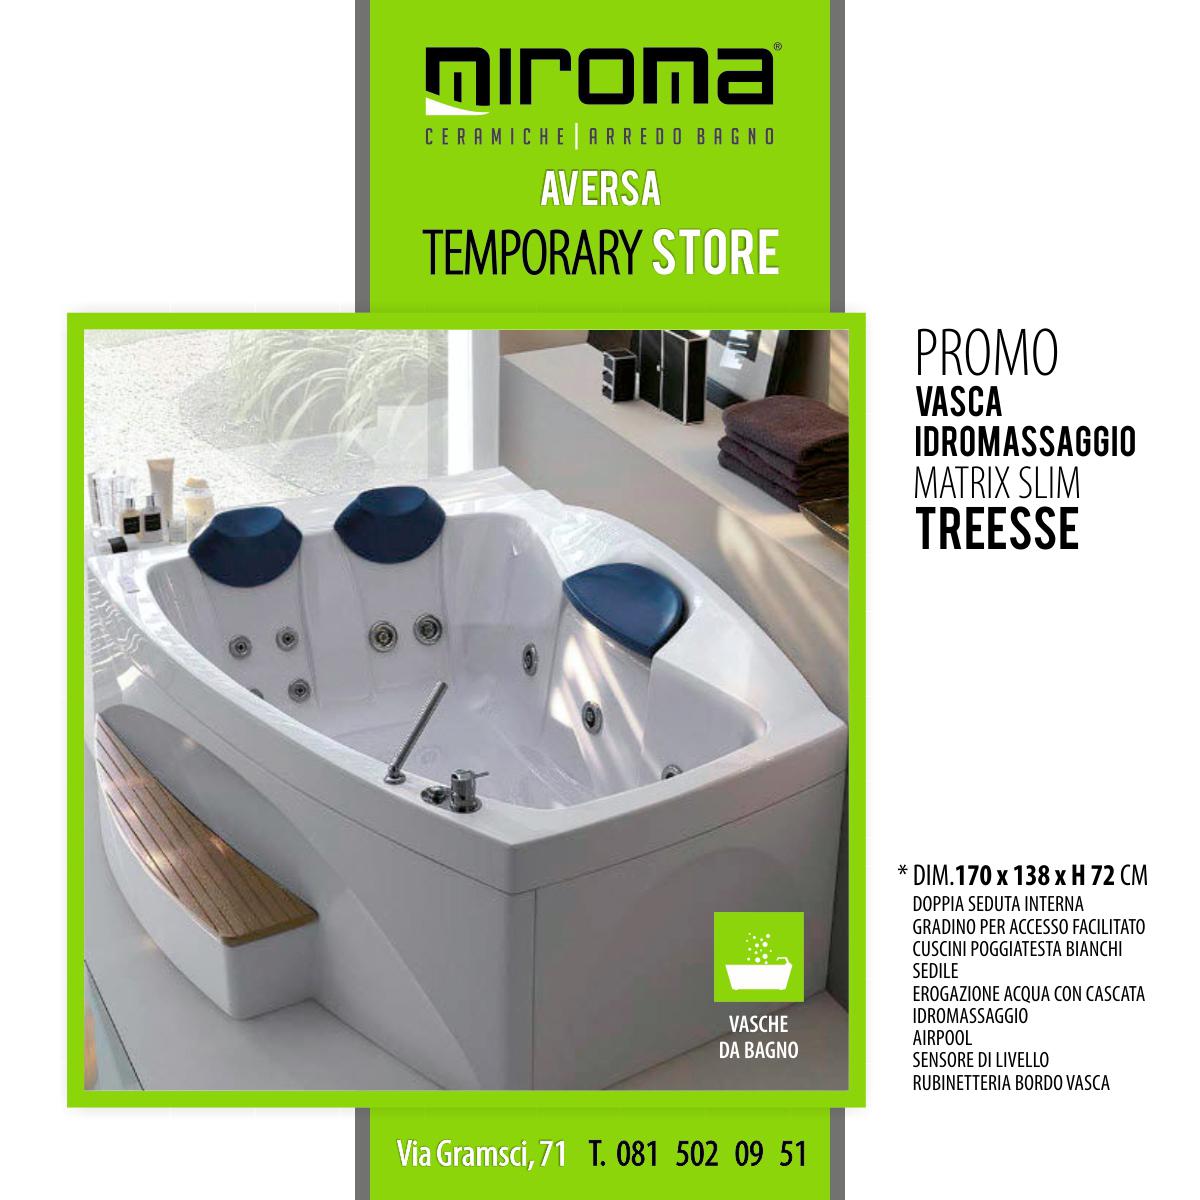 http://www.miromaceramiche.it/wp-content/uploads/2018/07/MATRIX_SLIM_TREESSE.jpg